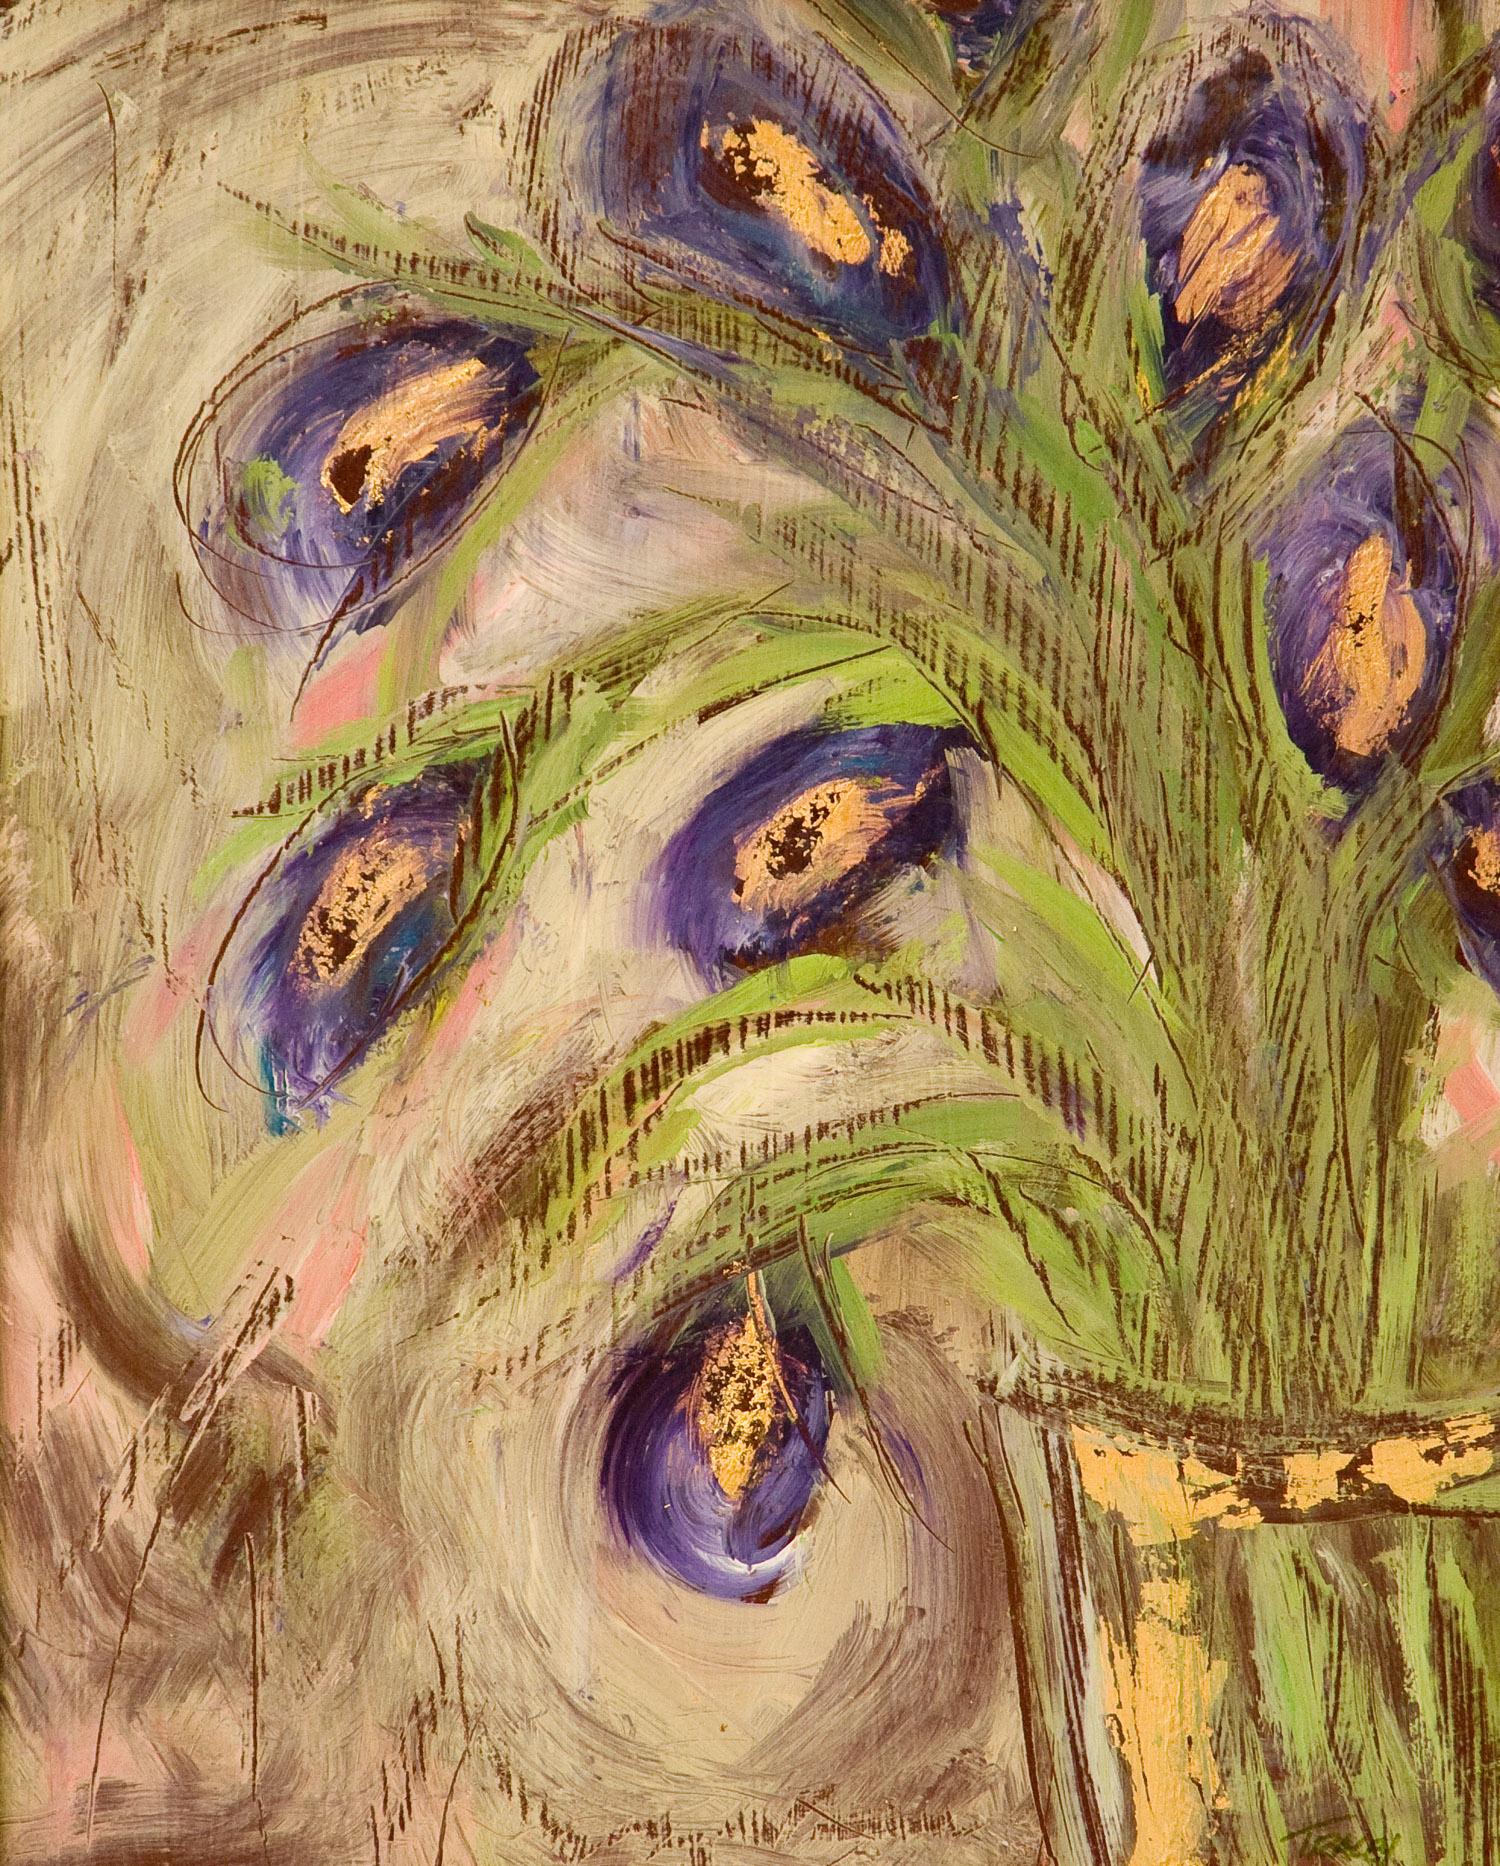 Tracey-J-Marshall-Flowers-and-Still-Life-321.jpg